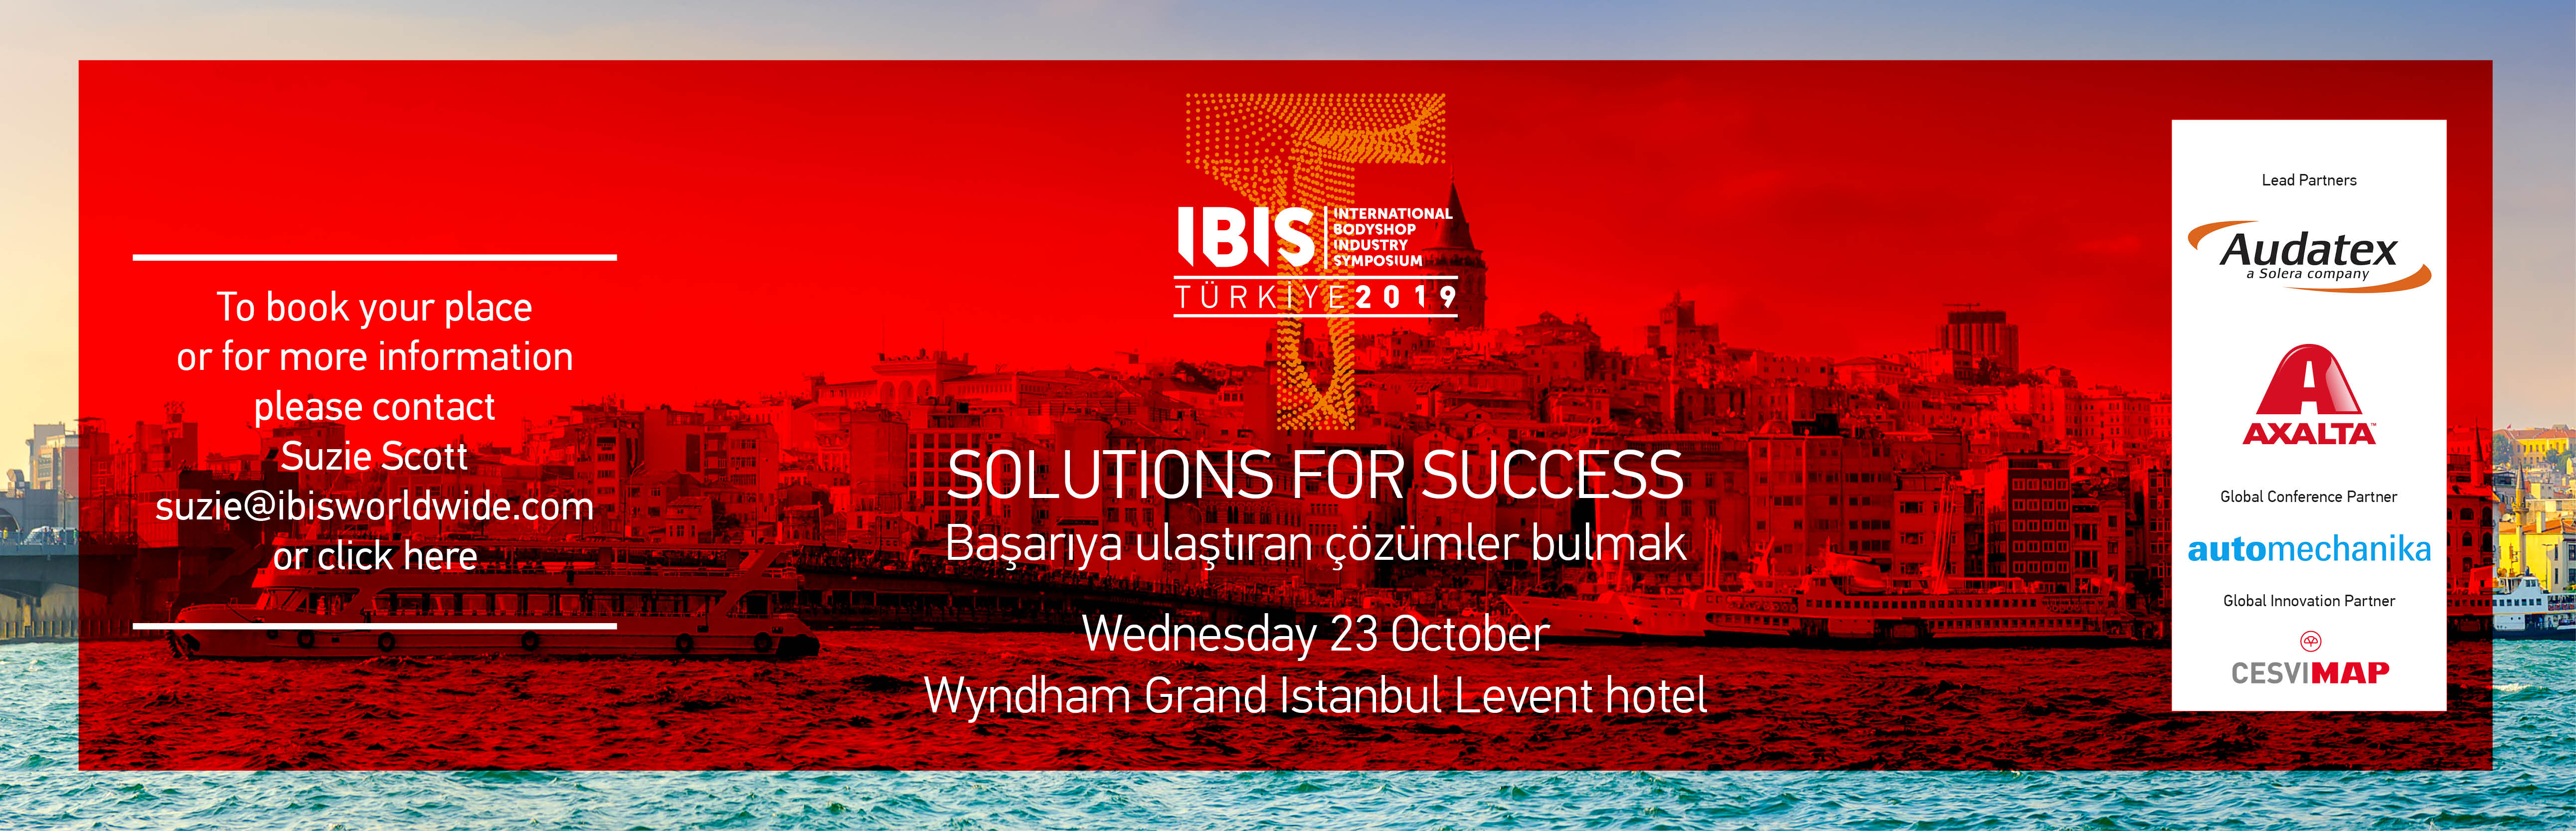 International Bodyshop Industry Symposium, global collision repair